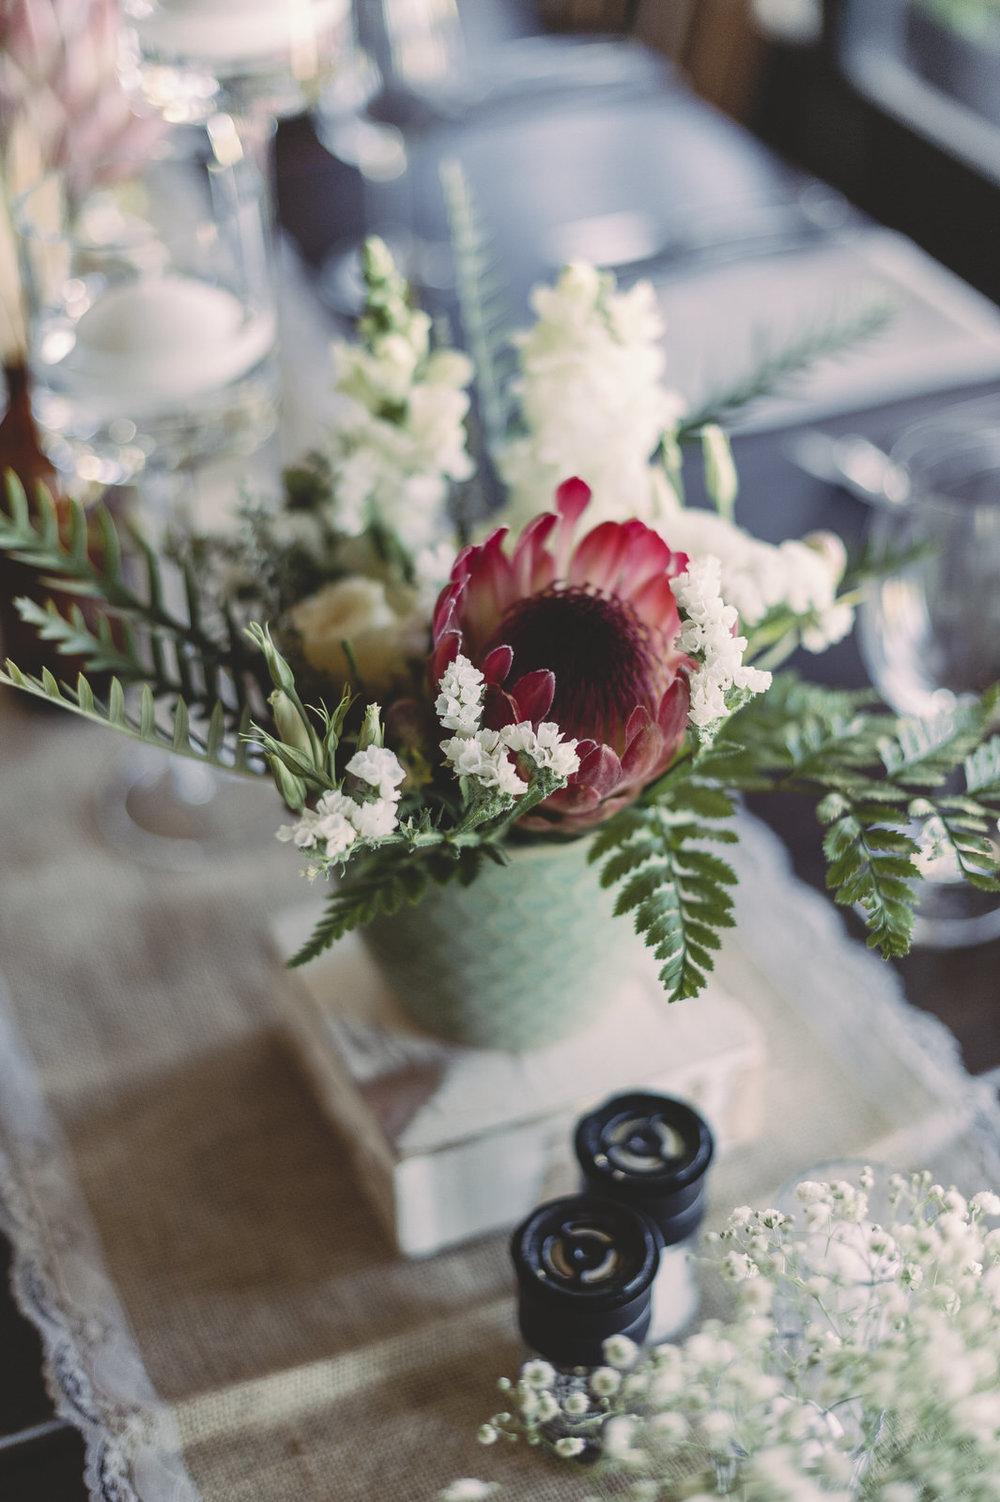 RyanParker_Wedding_CapeTown_Hermanus_GabrielsKloof_E+P_DSC_6256.jpg